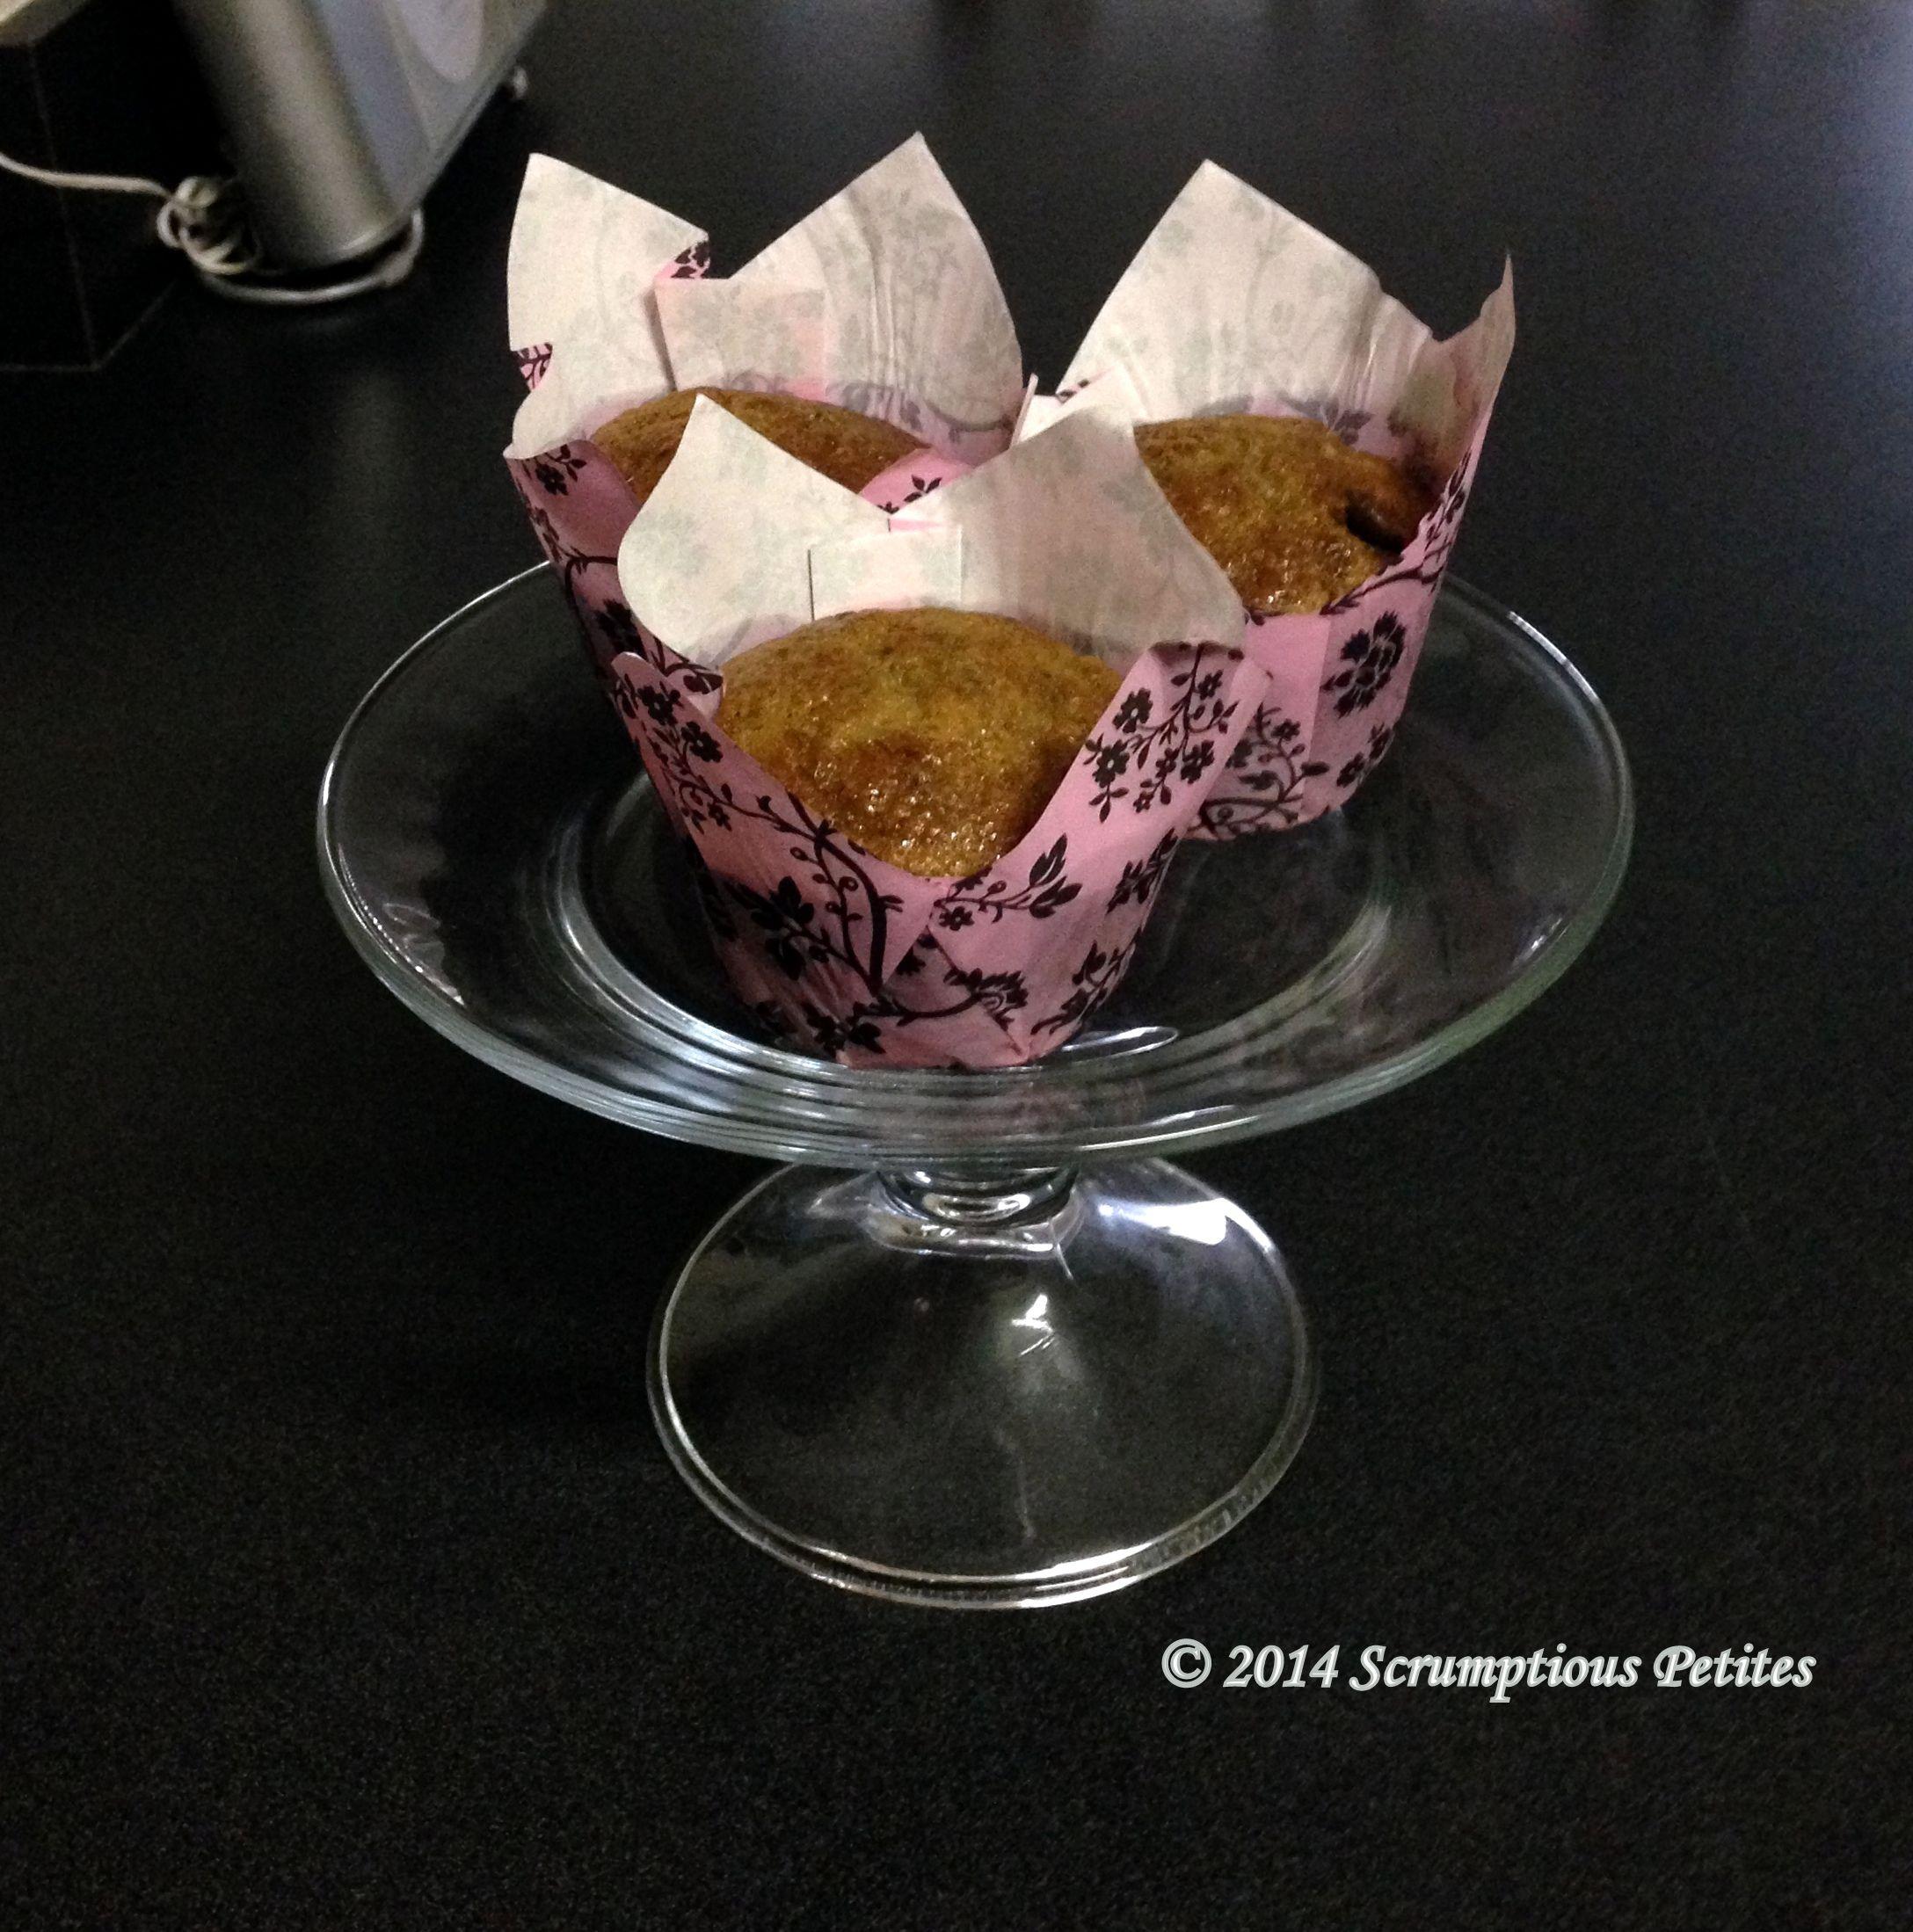 2014 Cancer Awareness Month - week 3 - Chunky Monkey Muffins http://www.scrumptiouspetites.com https://www.facebook.com/ScrumptiousPetites